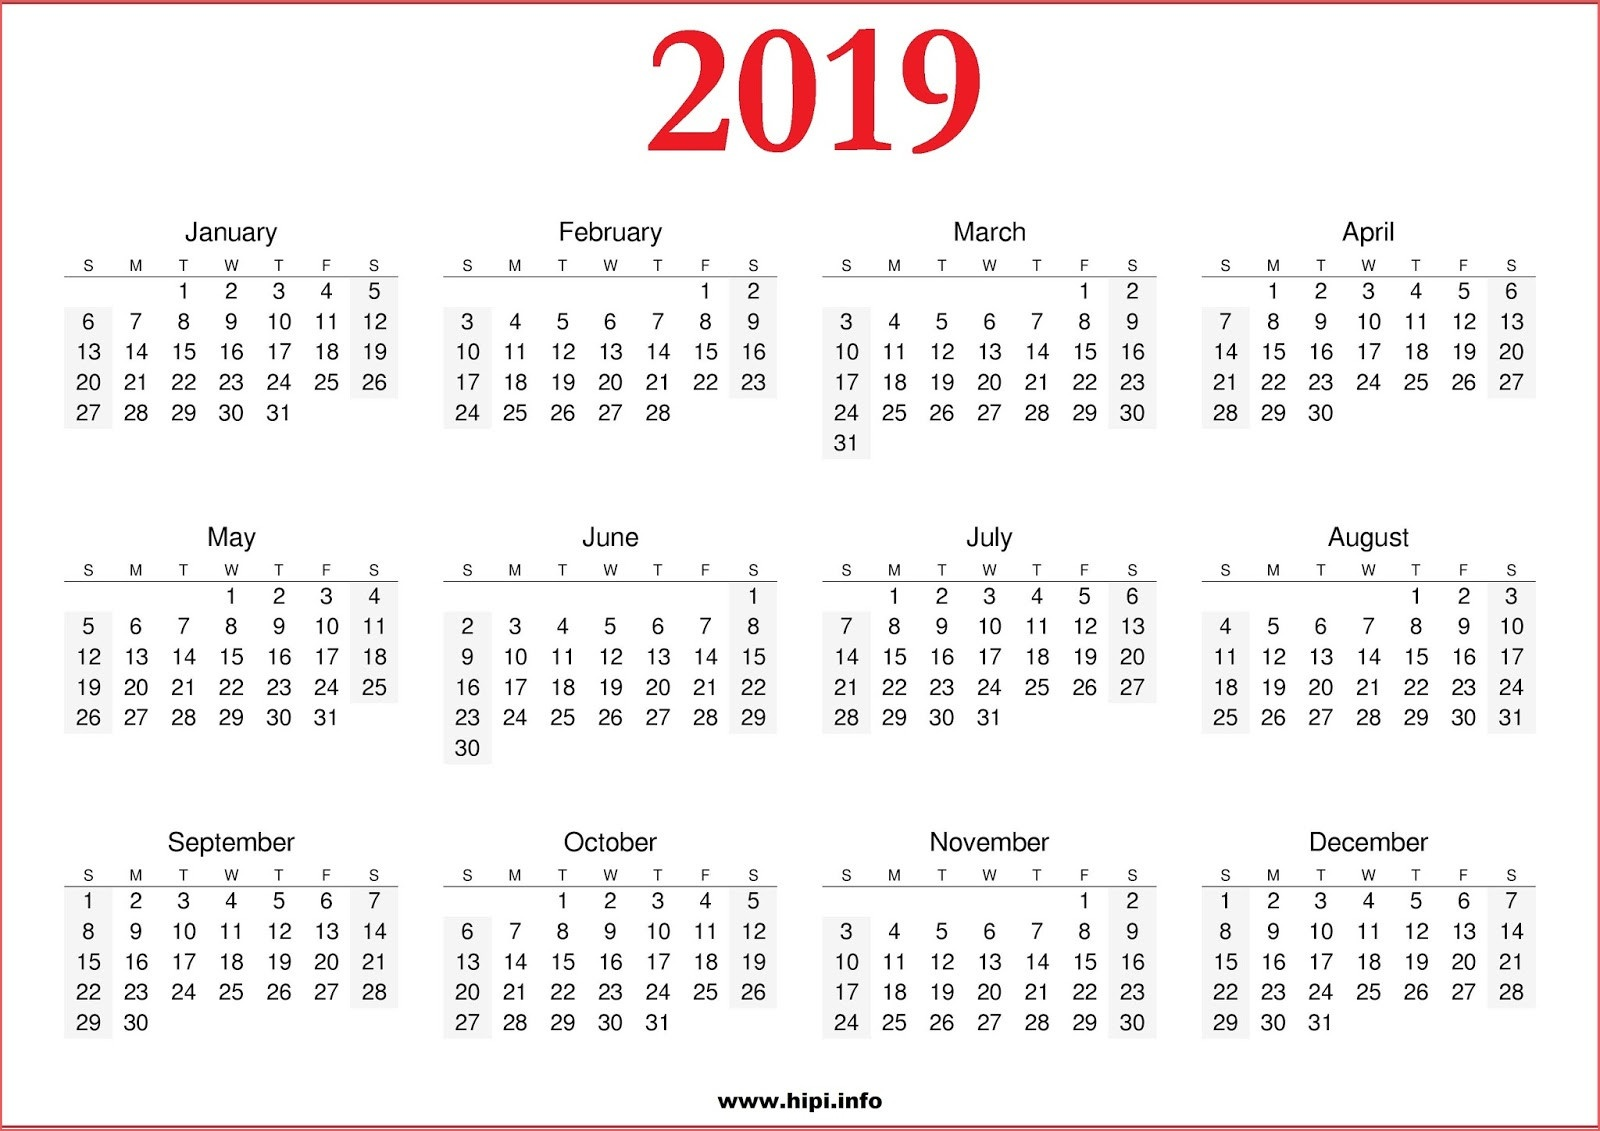 June 2019 Blank Calendar Template Free Printable Blank Calendar 2019 - Free Printable Facebook Template